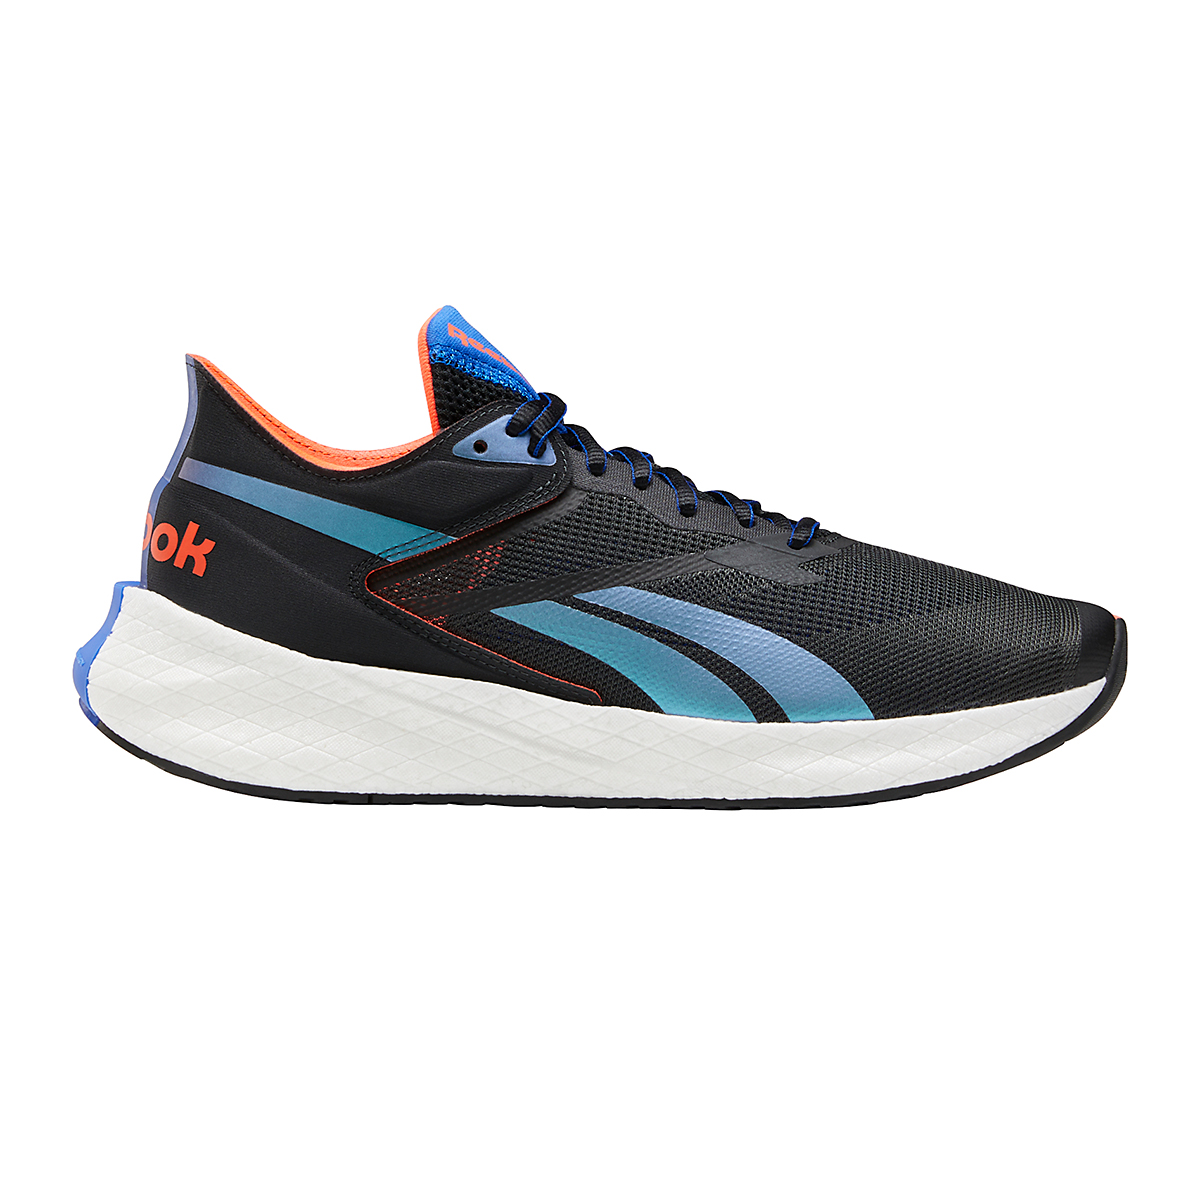 Men's Reebok Floatride Energy Symmetros Running Shoe - Color: Night Black/Court Blue/Orange Flare - Size: 7 - Width: Regular, Night Black/Court Blue/Orange Flare, large, image 1